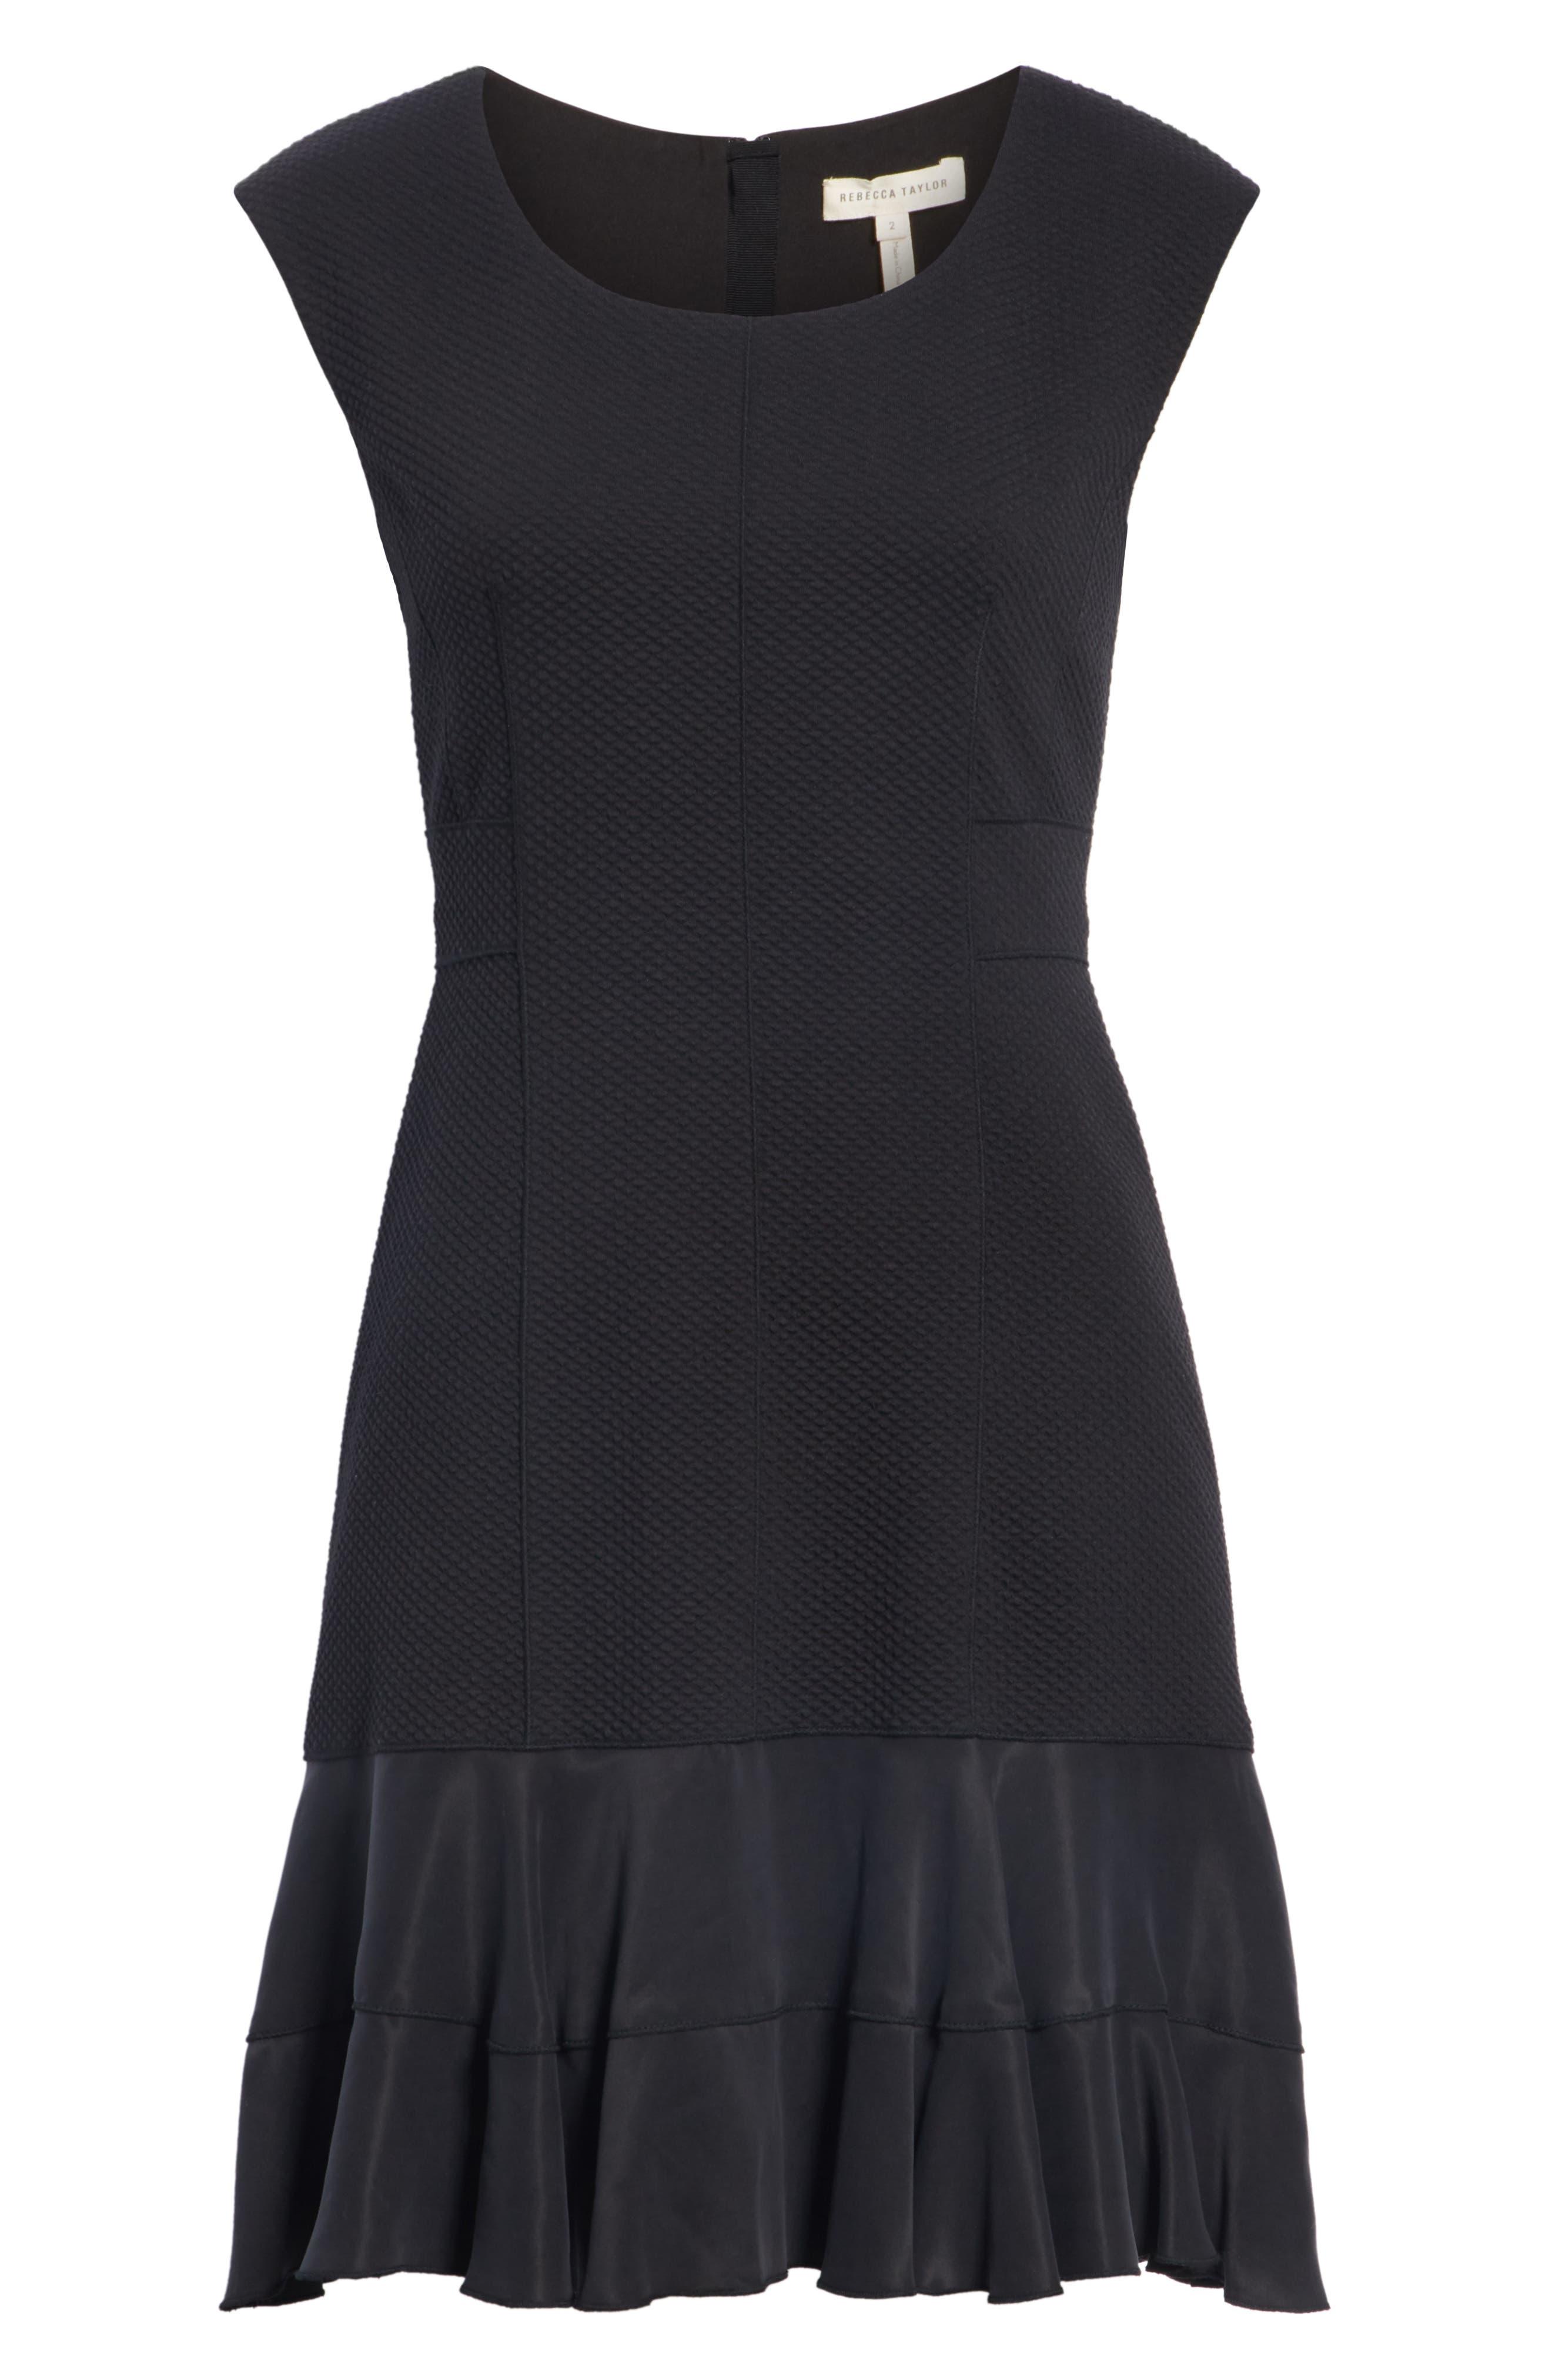 Honeycomb Fit & Flare Dress,                             Alternate thumbnail 7, color,                             BLACK